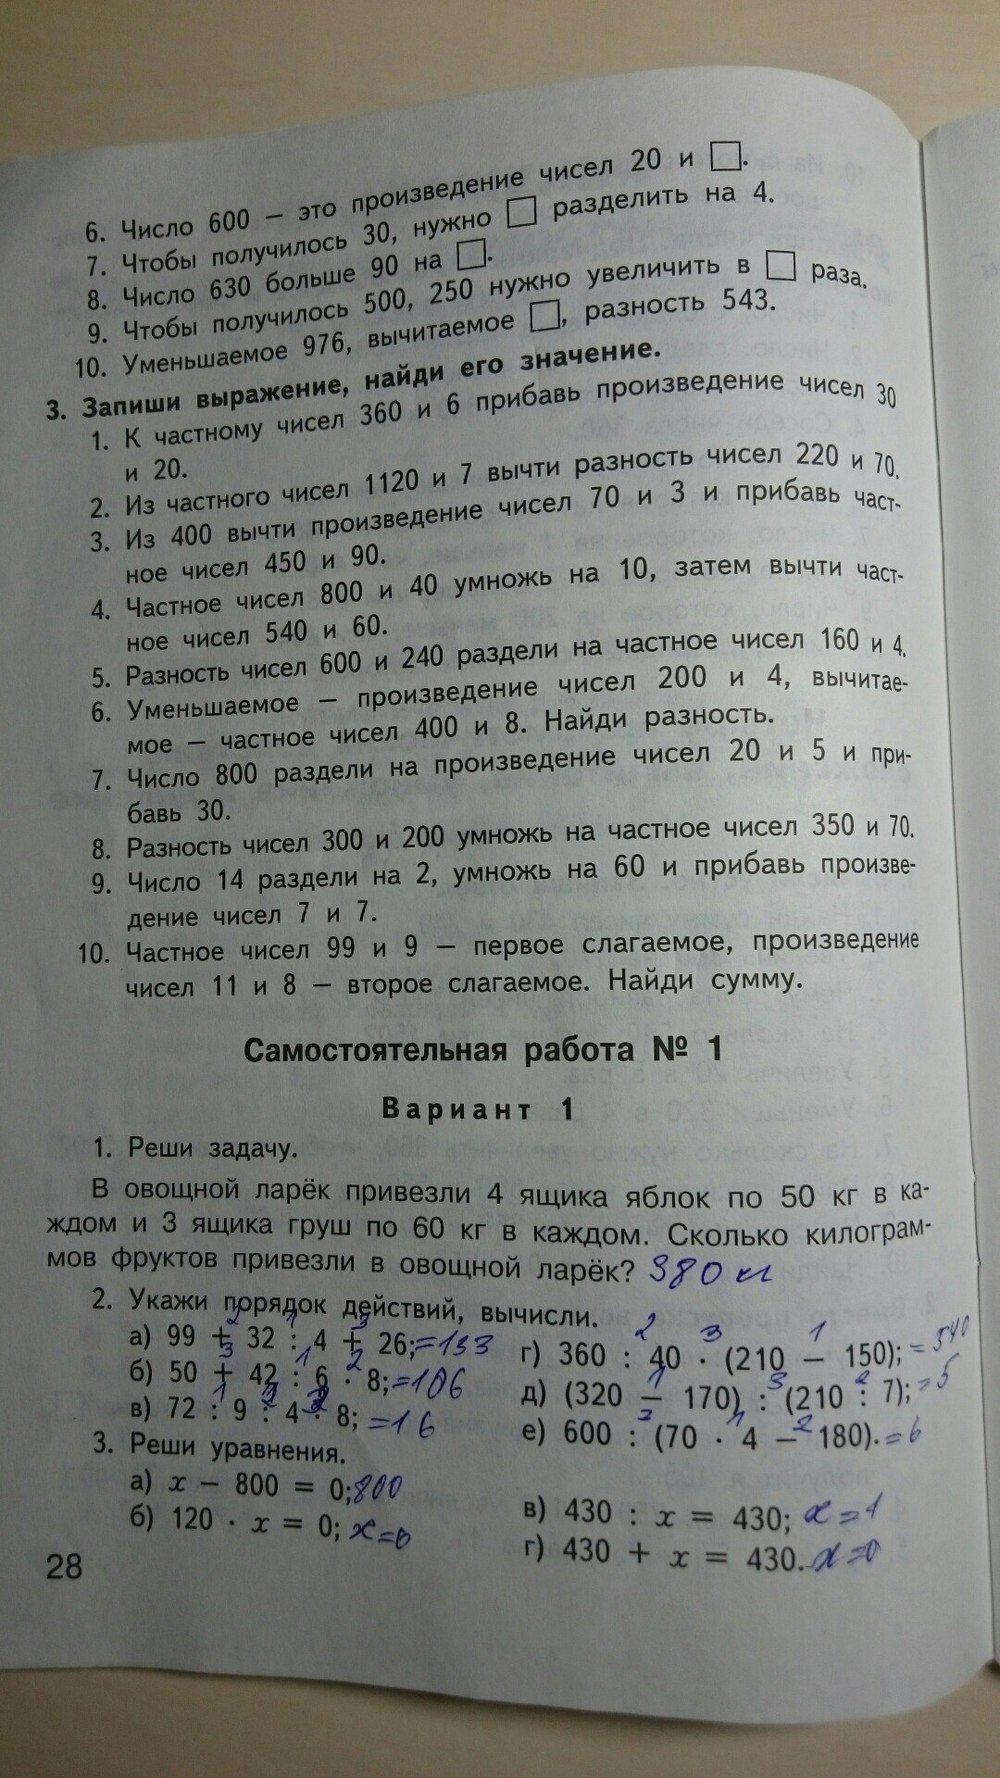 решебник по татарскому языку 11 класс сафиуллина